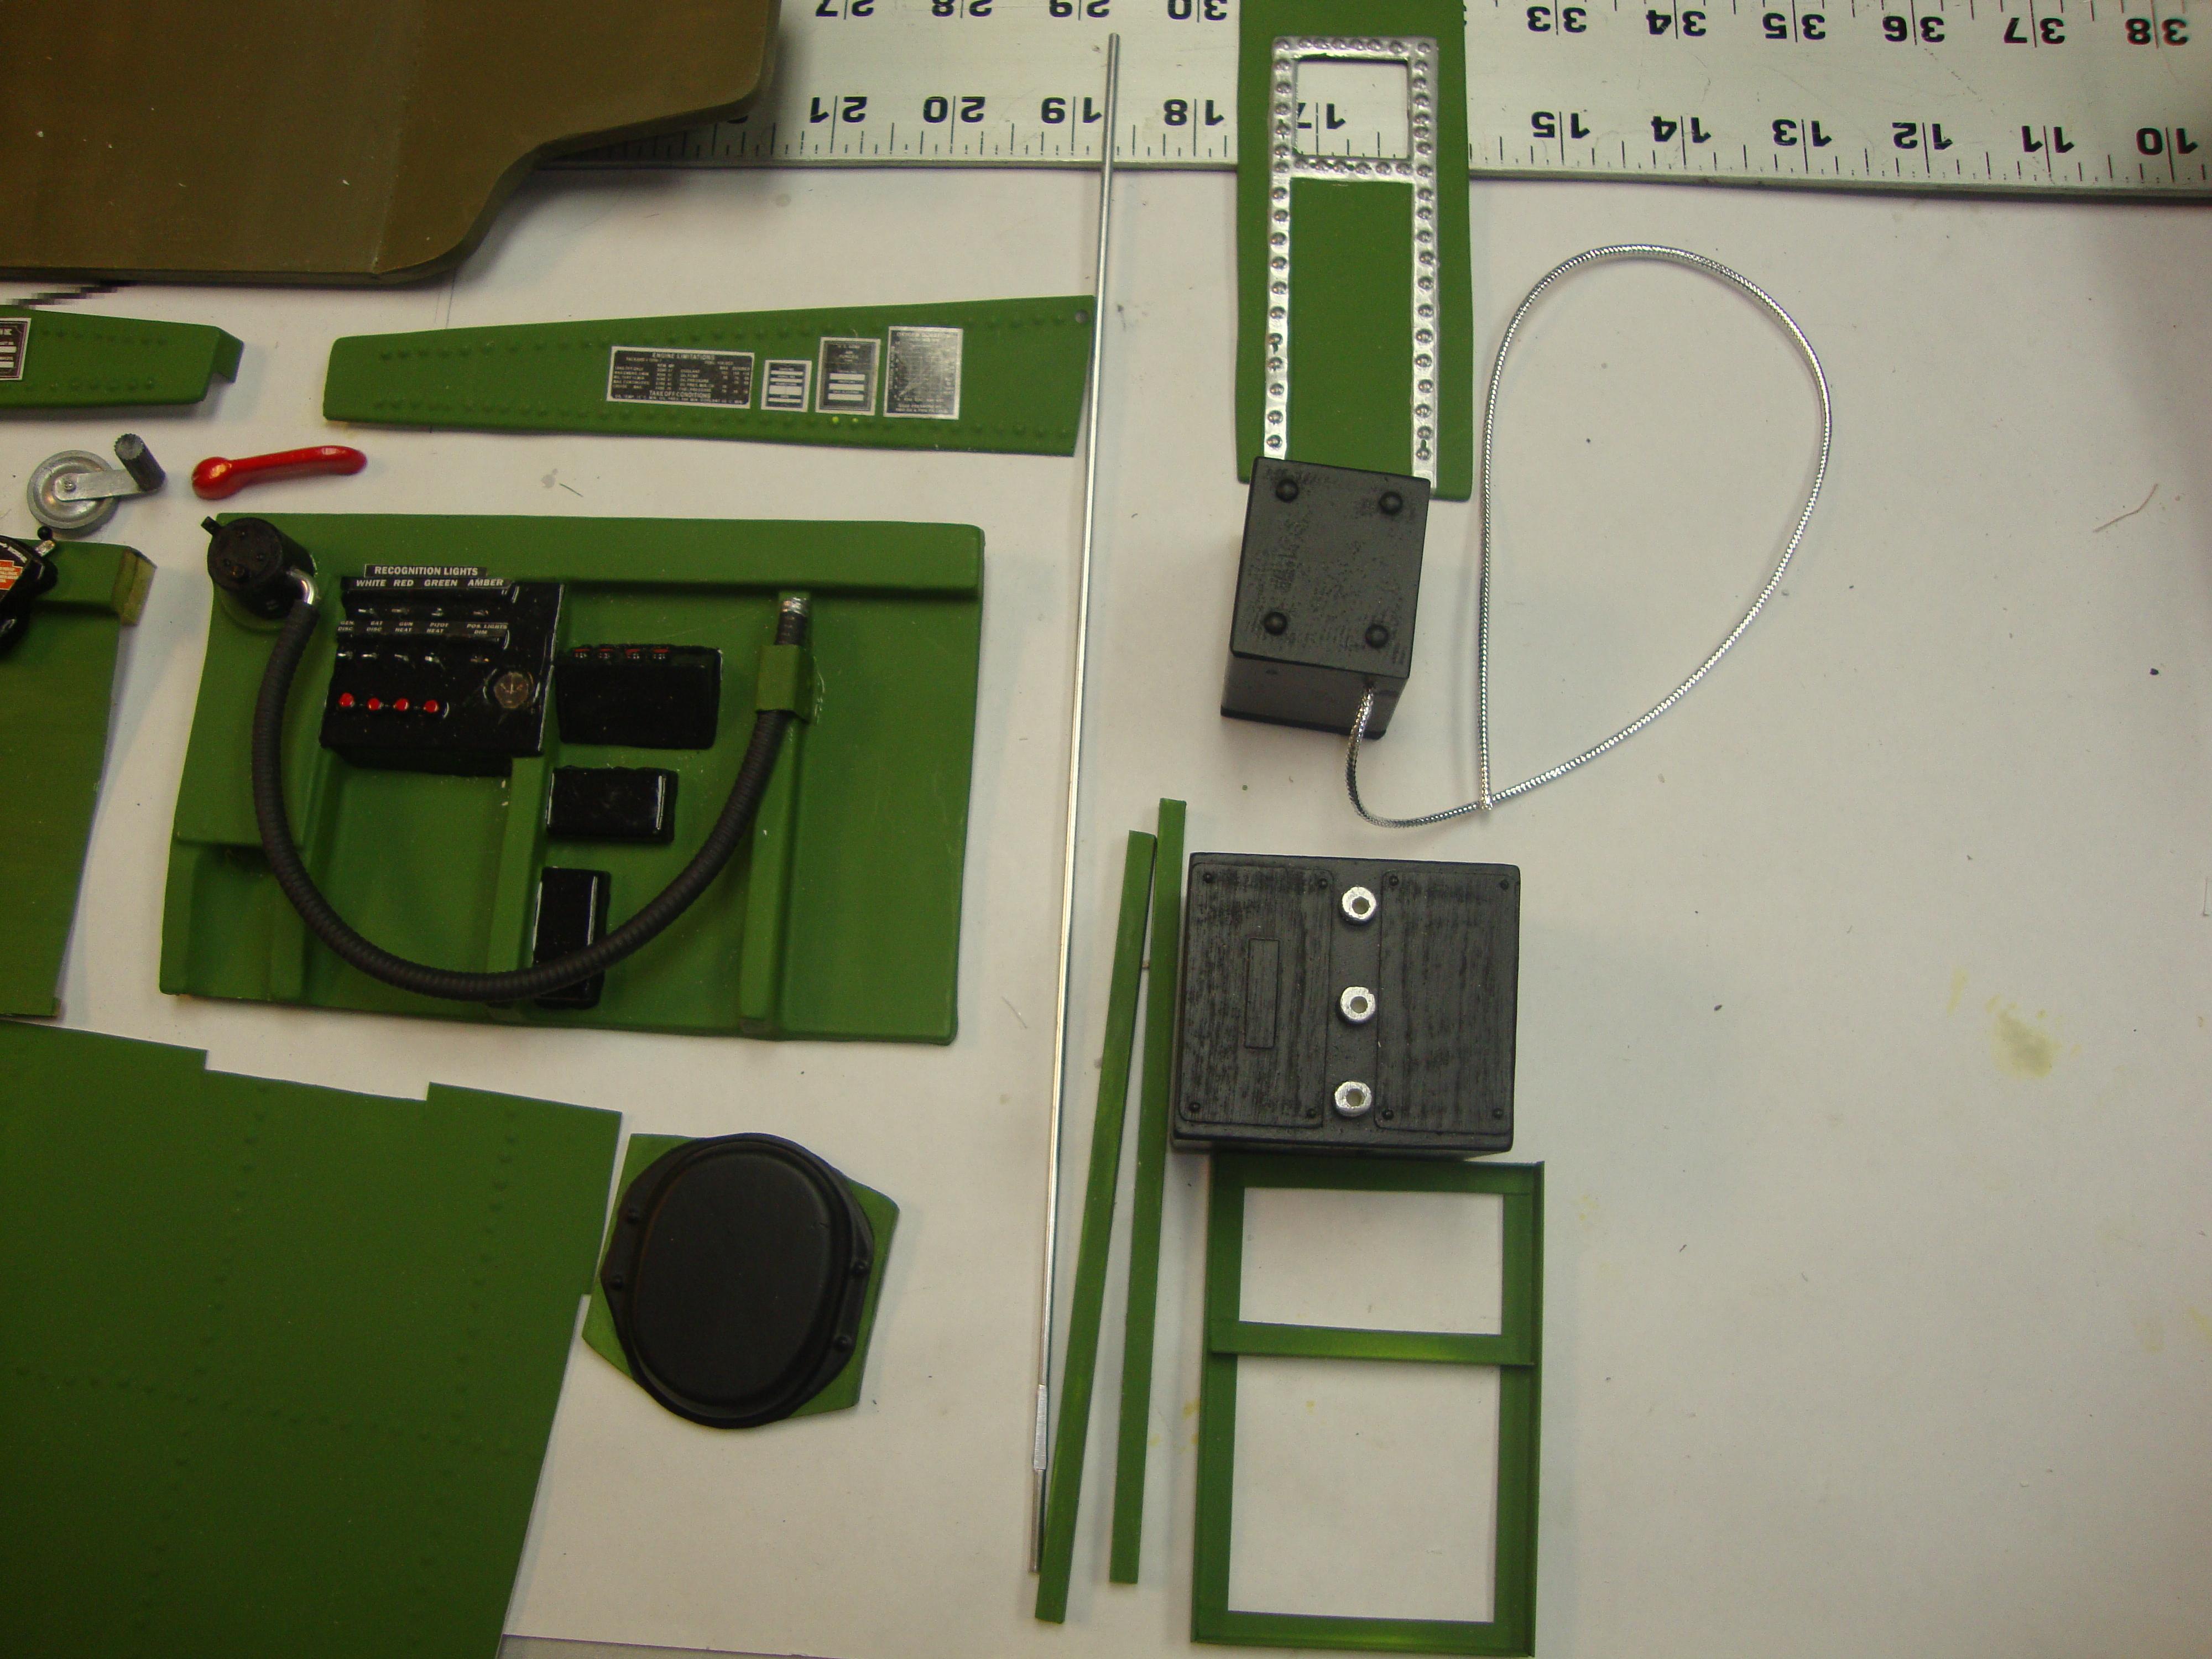 Click image for larger version  Name:I13 Cockpit.JPG Views:49 Size:3.83 MB ID:2134117